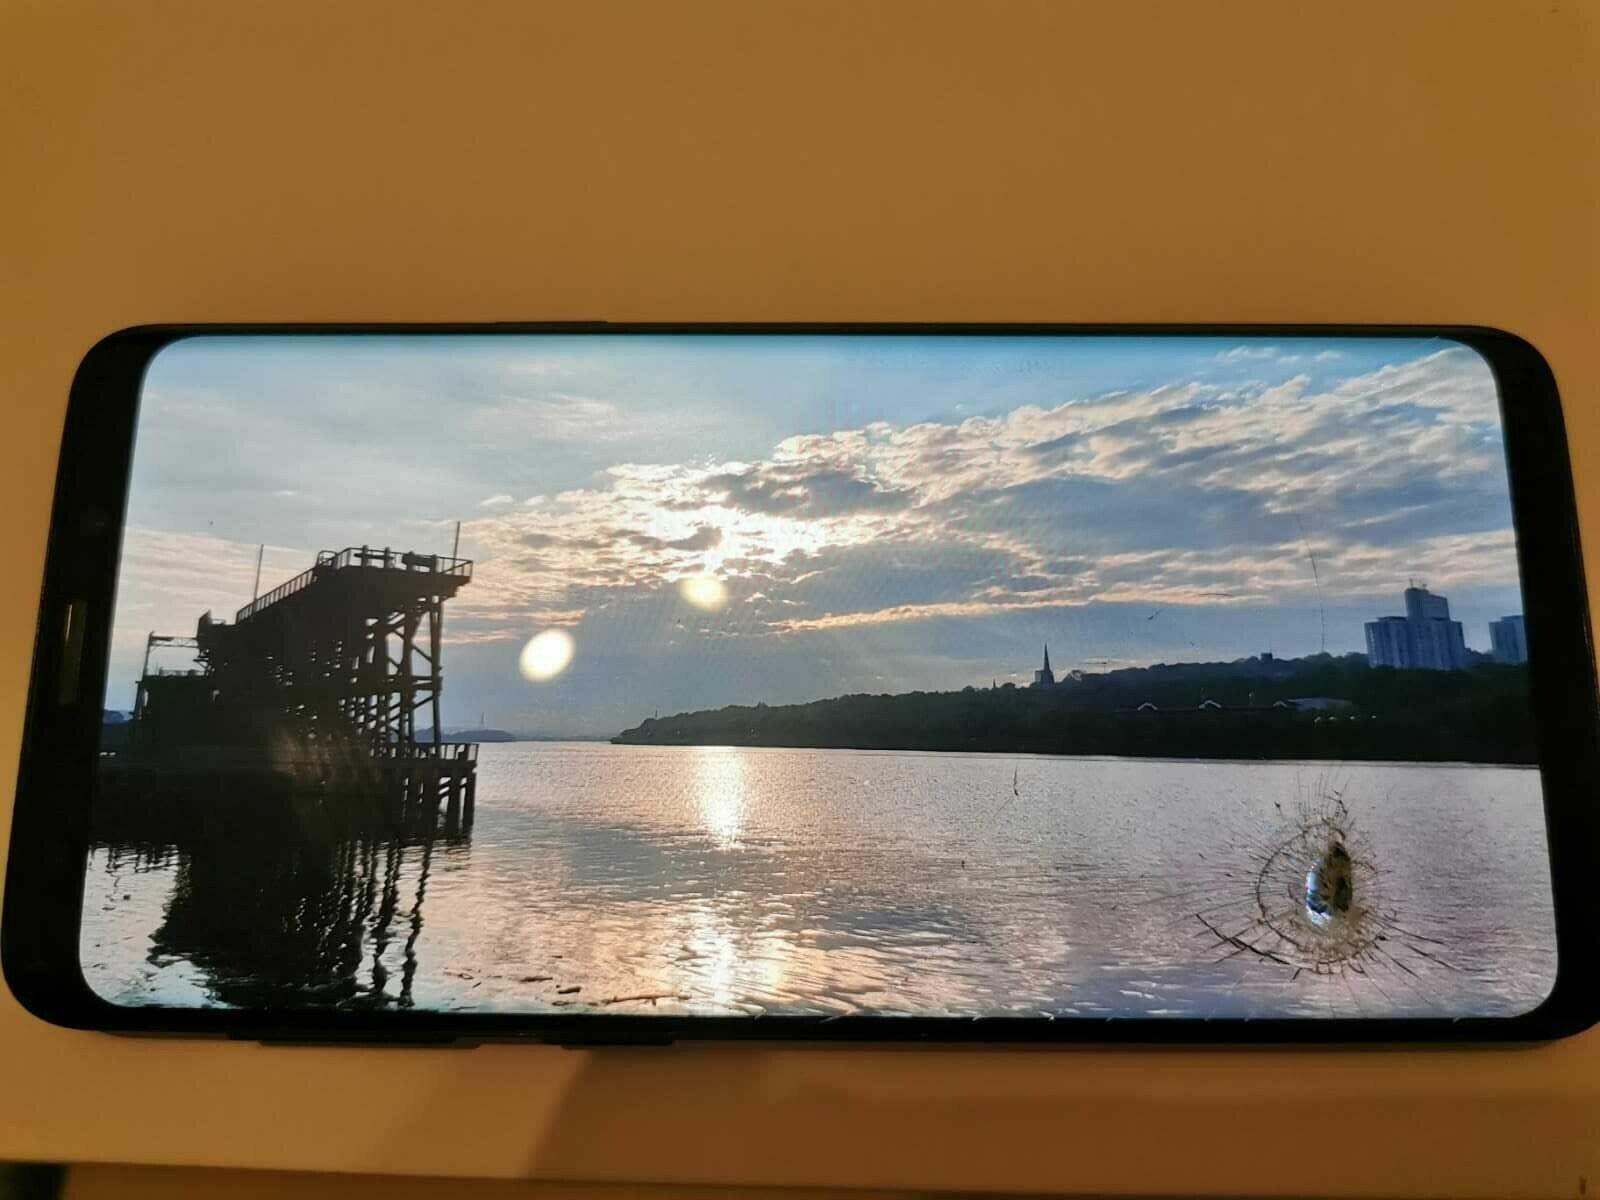 Android Phone - Samsung Galaxy S9 SM-G960F (Unlocked) (damage) Black - 64GB/4GB Ram